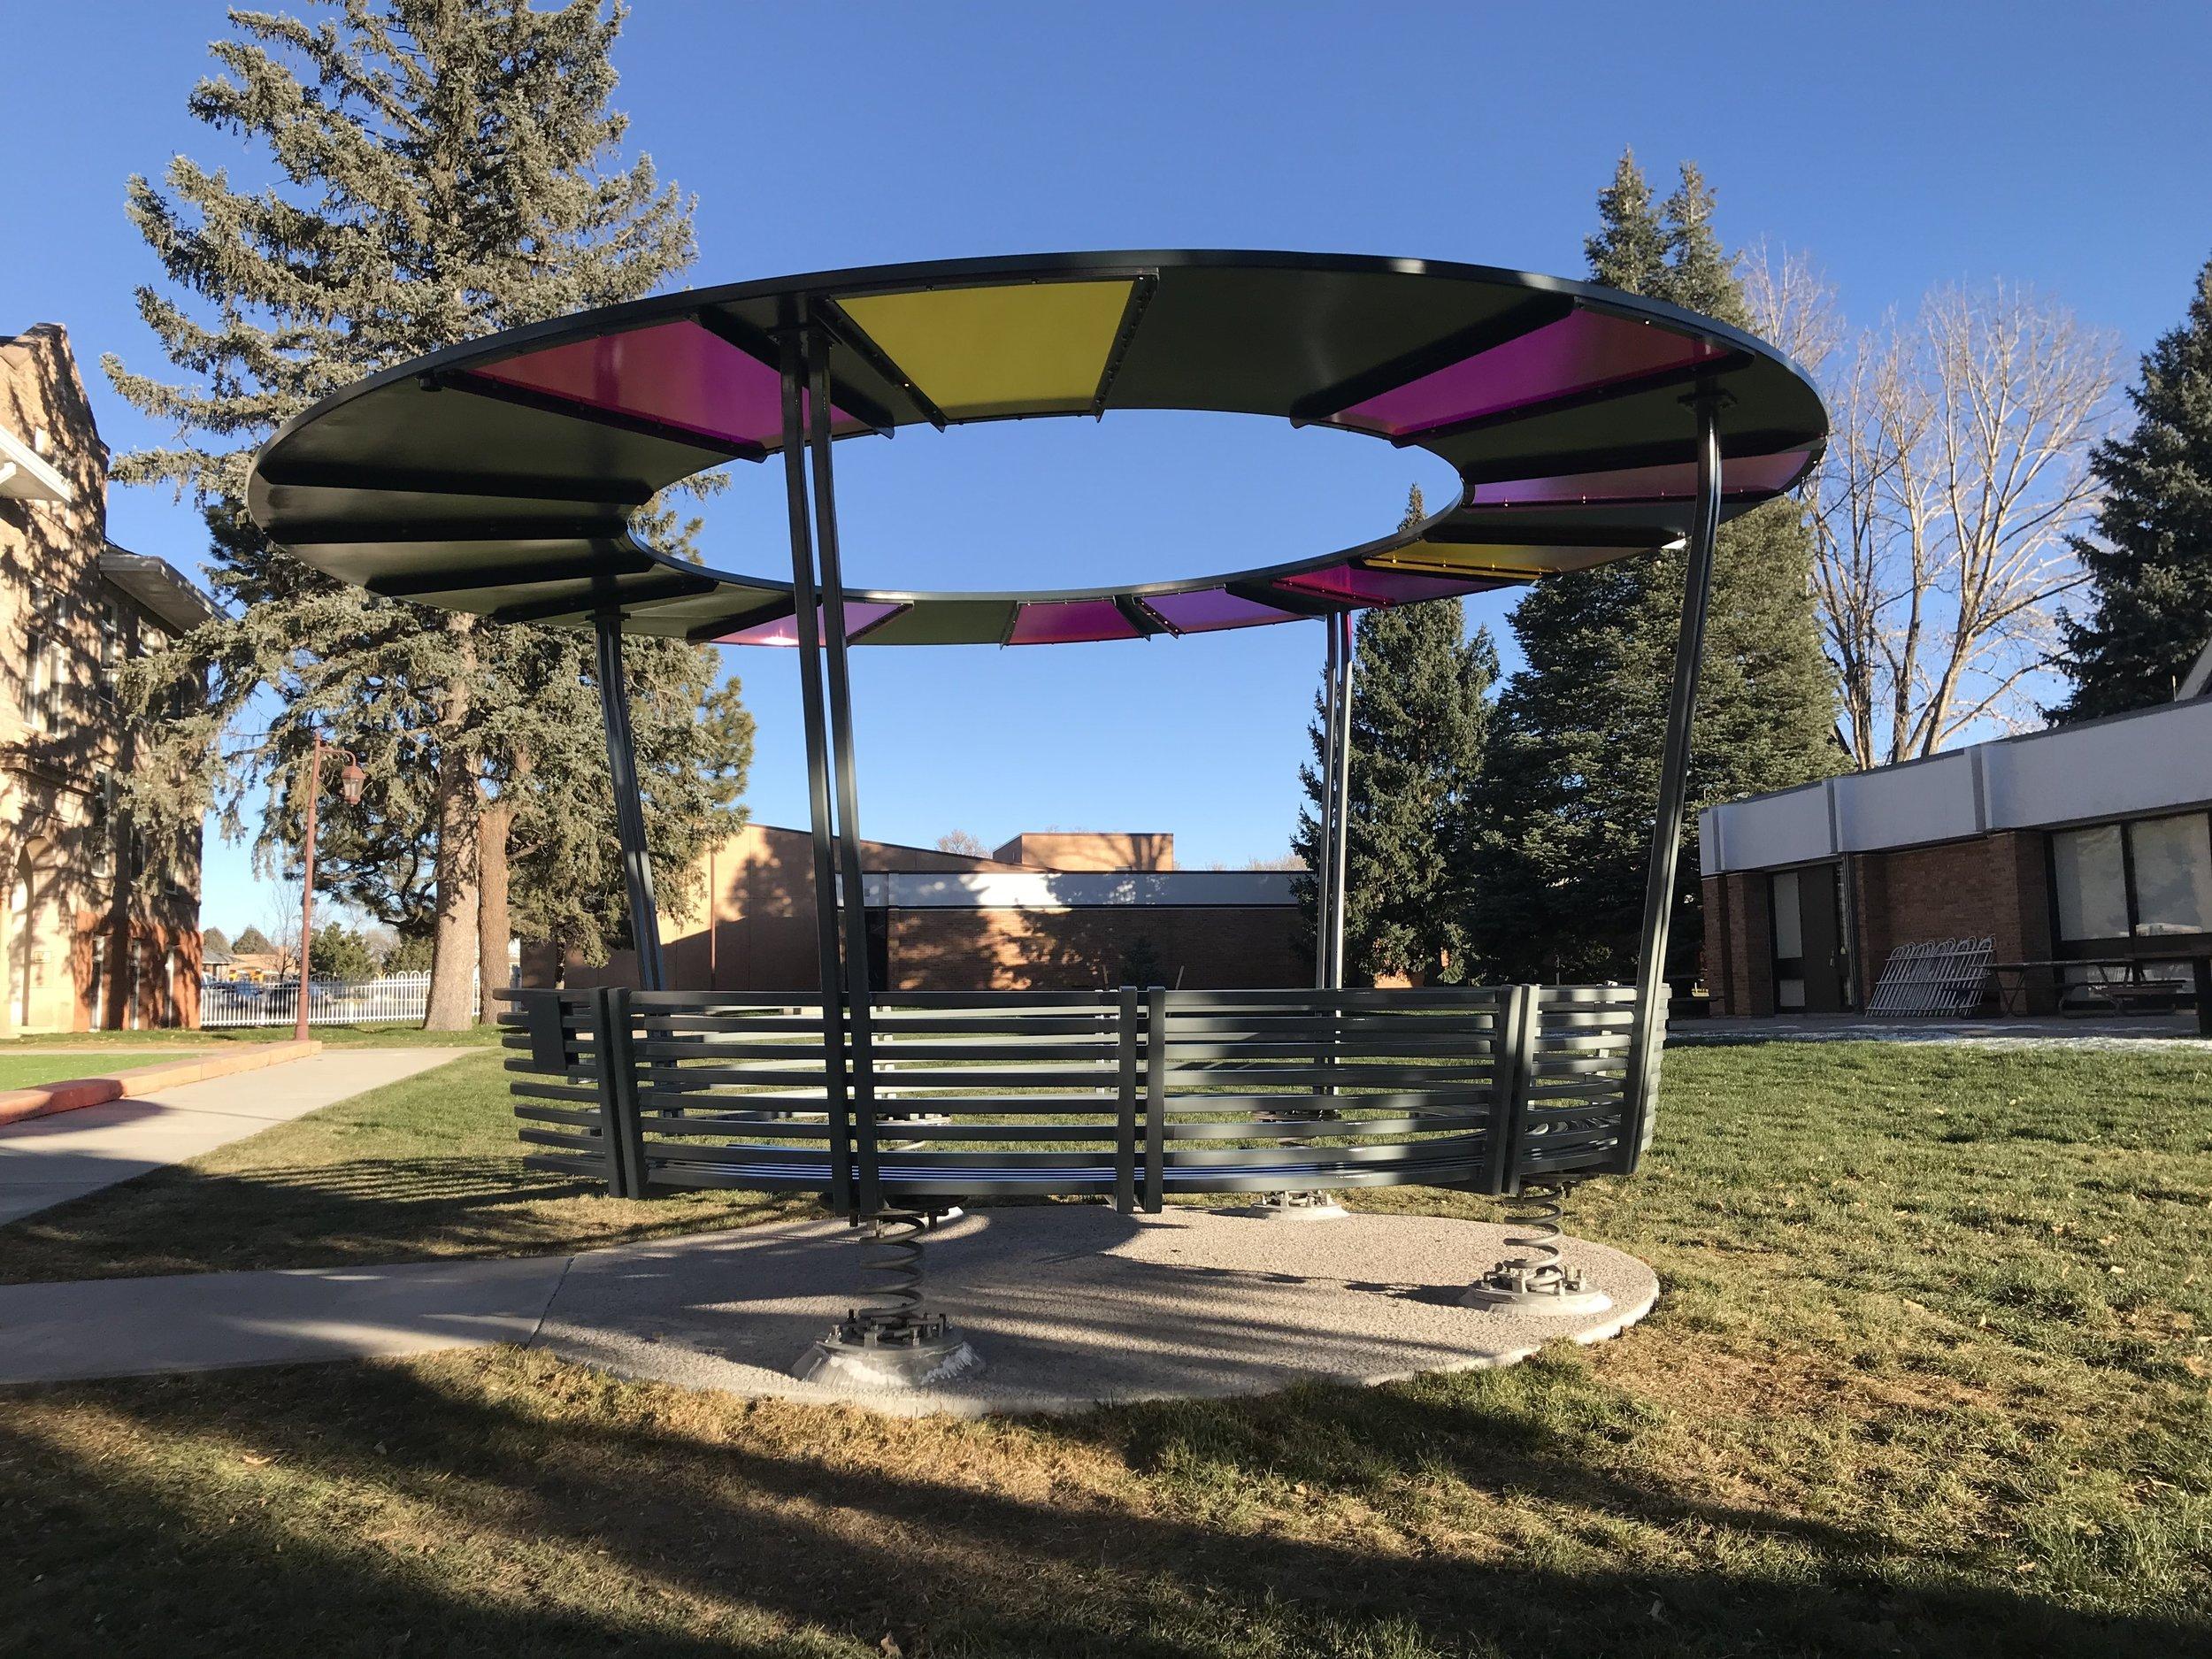 Matthew Geller_Springs_Colorado Springs_Public Art Services_J Grant Projects_17.JPG